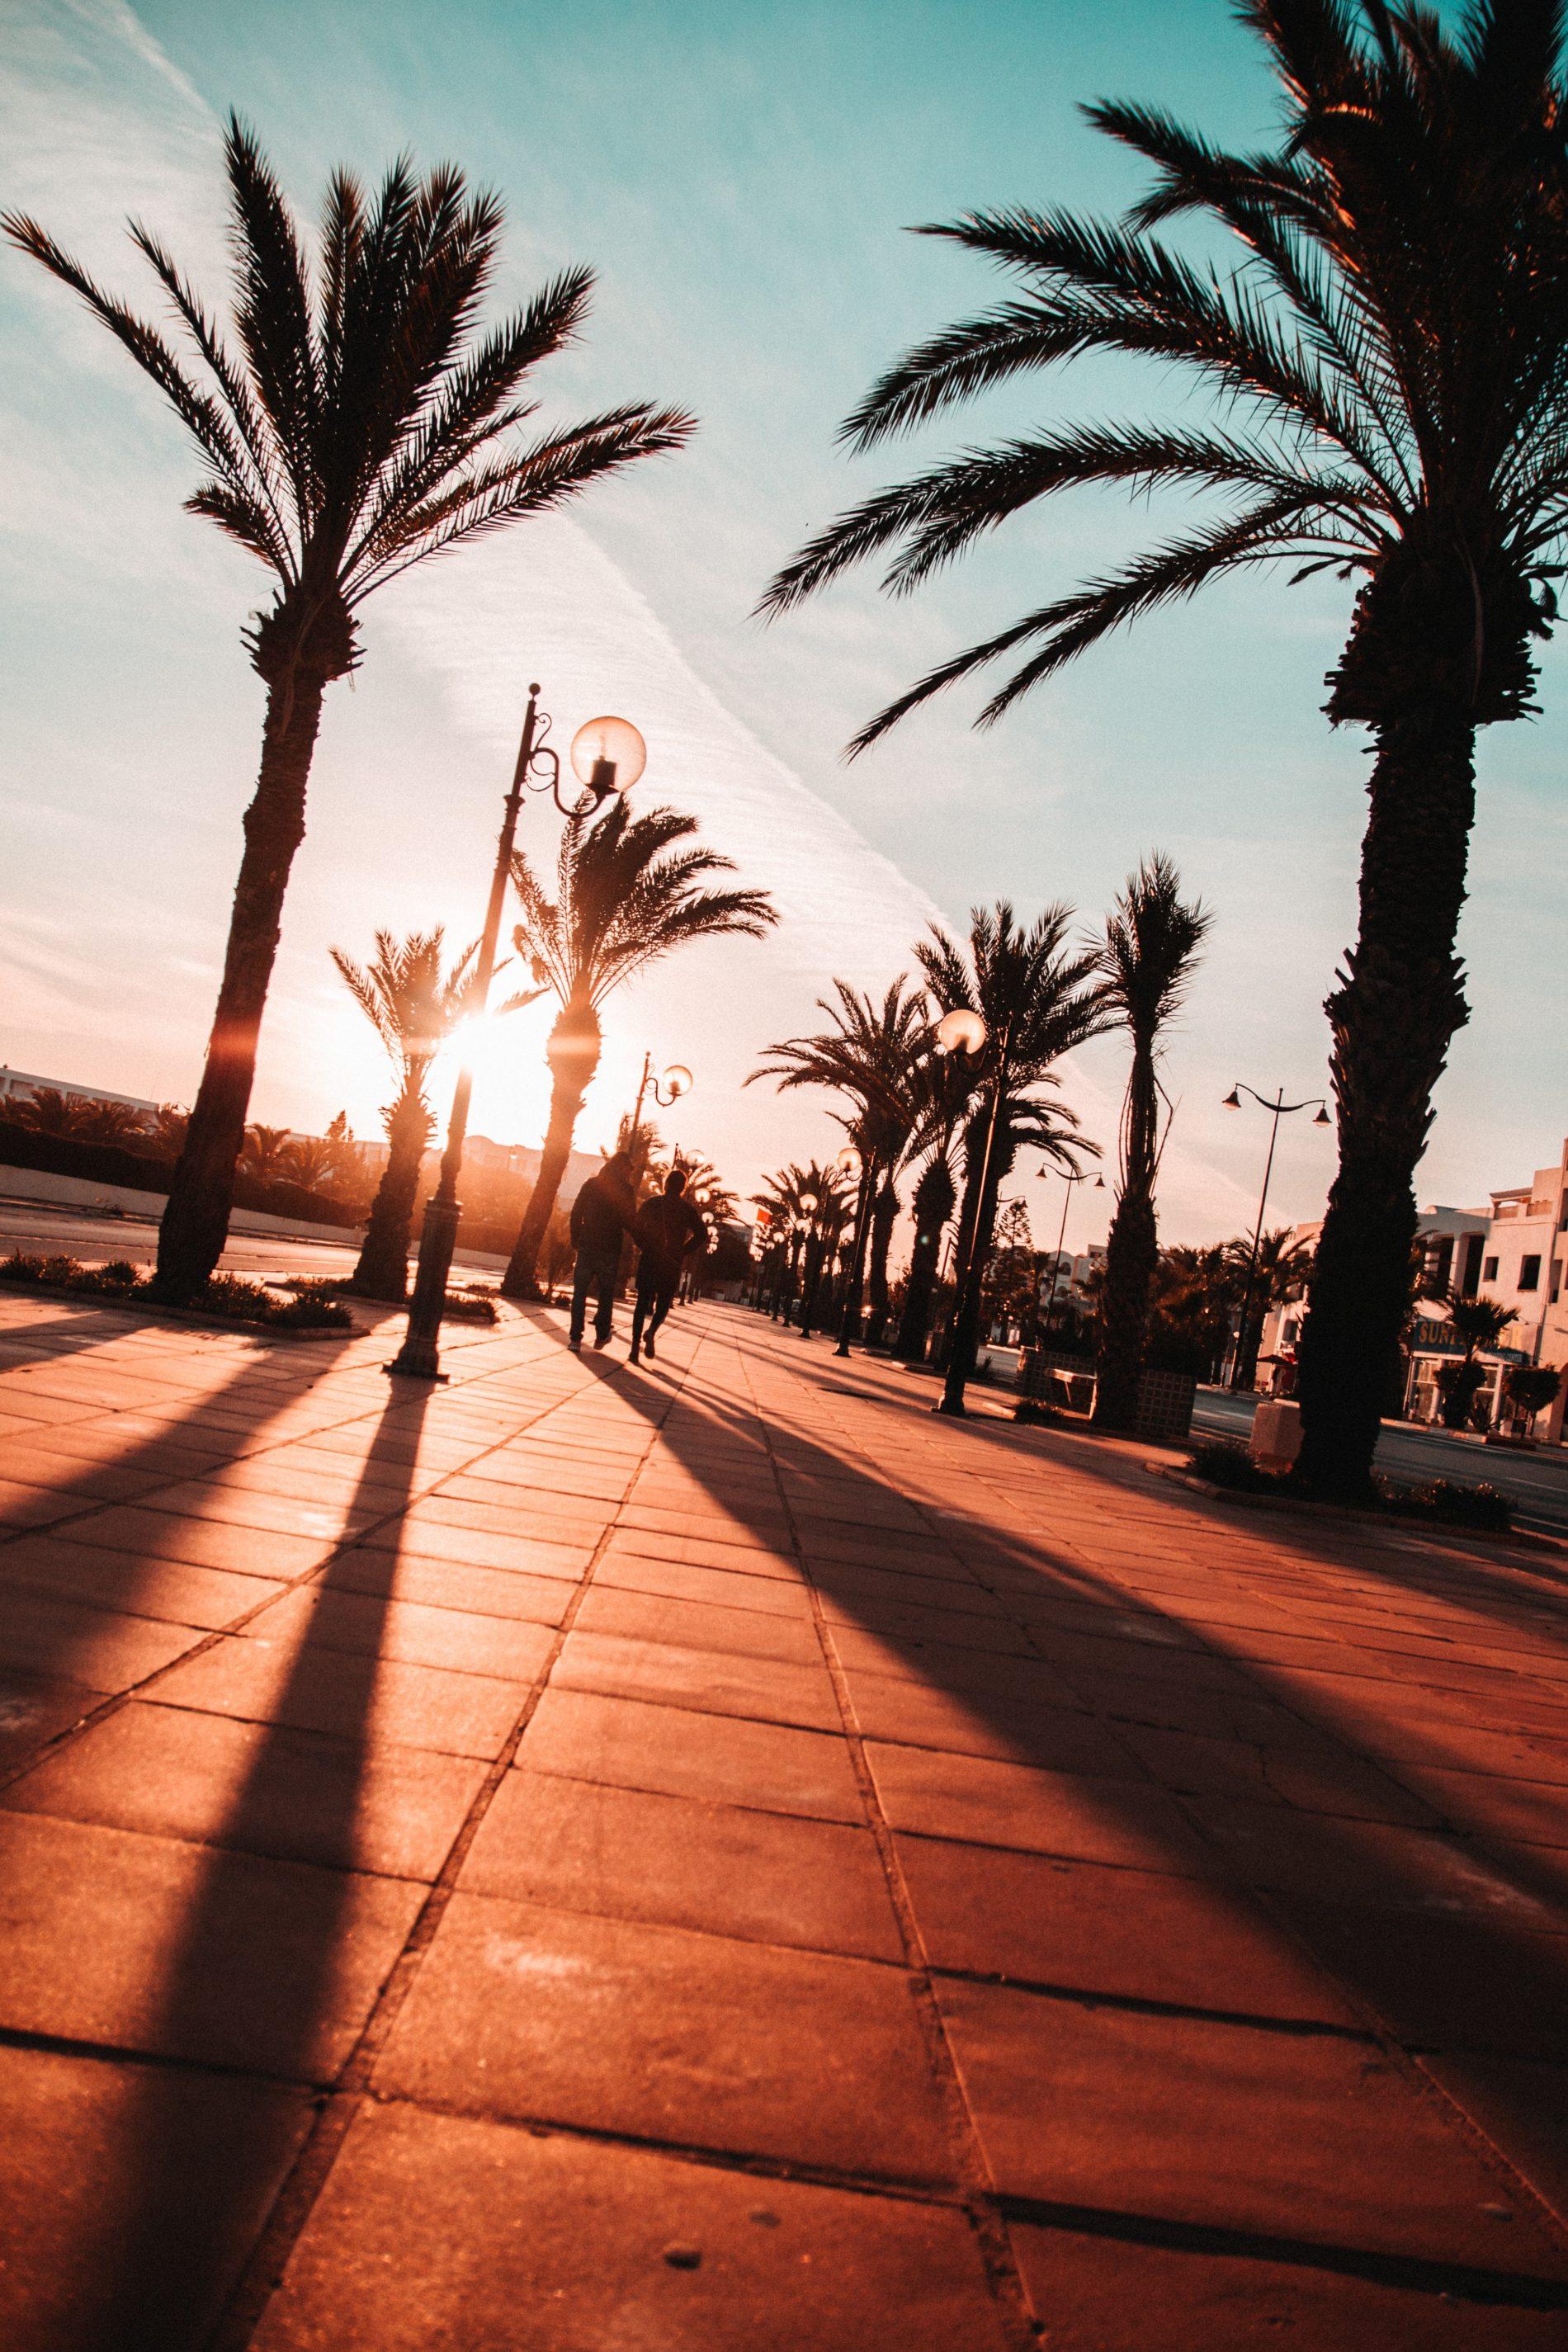 adrian dascal lVZ46hihCi0 unsplash 1900x2850 - Летим в Тунис - лайфхаки для путешествия